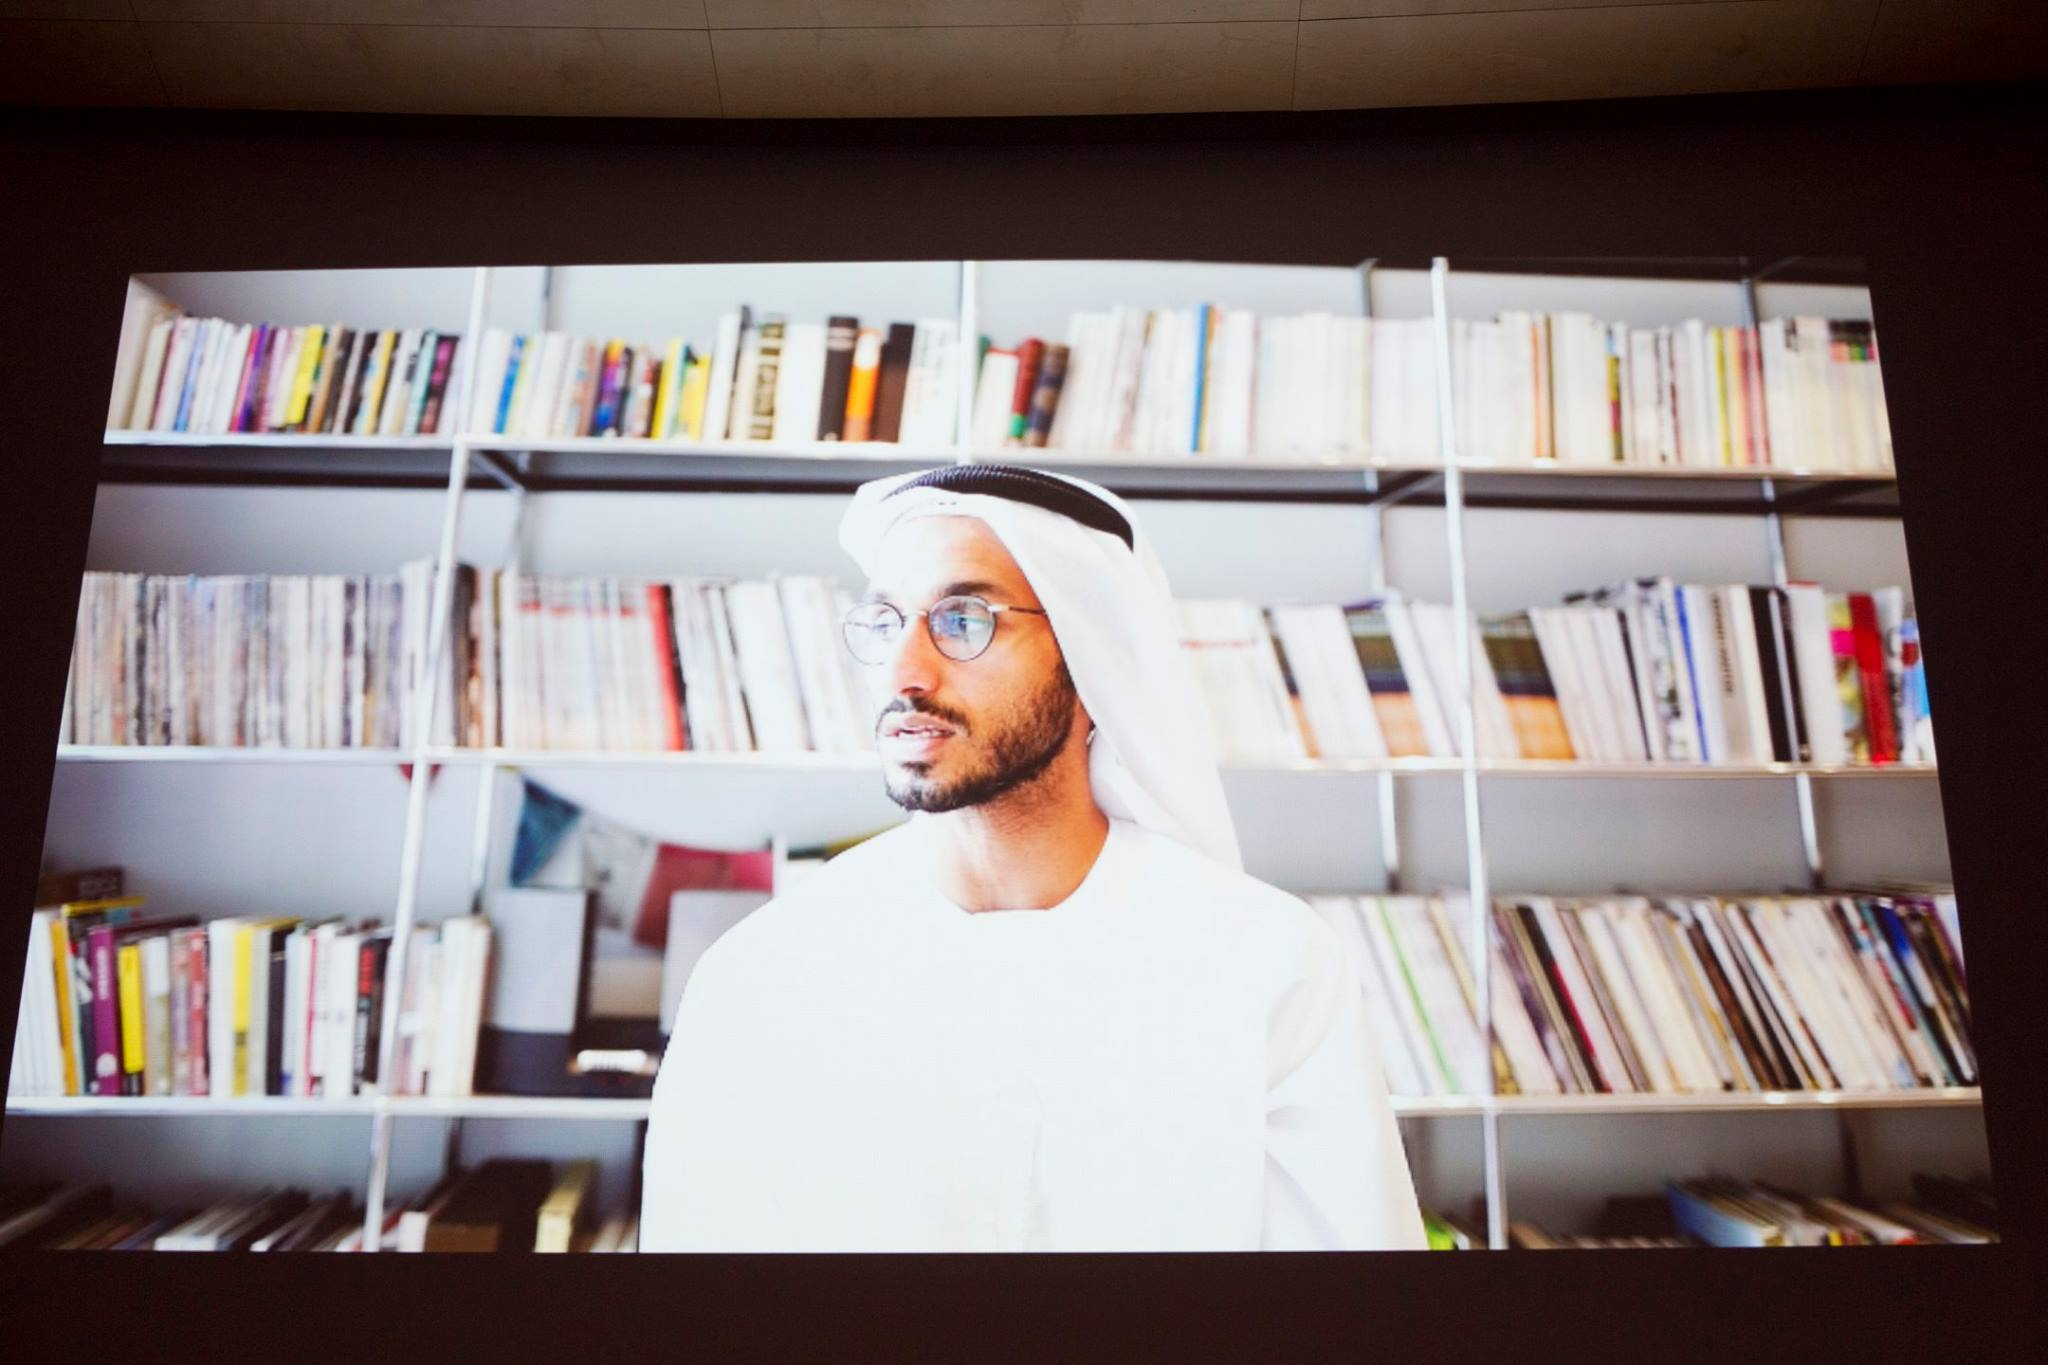 Ahmed & Rashid Bin Shabib